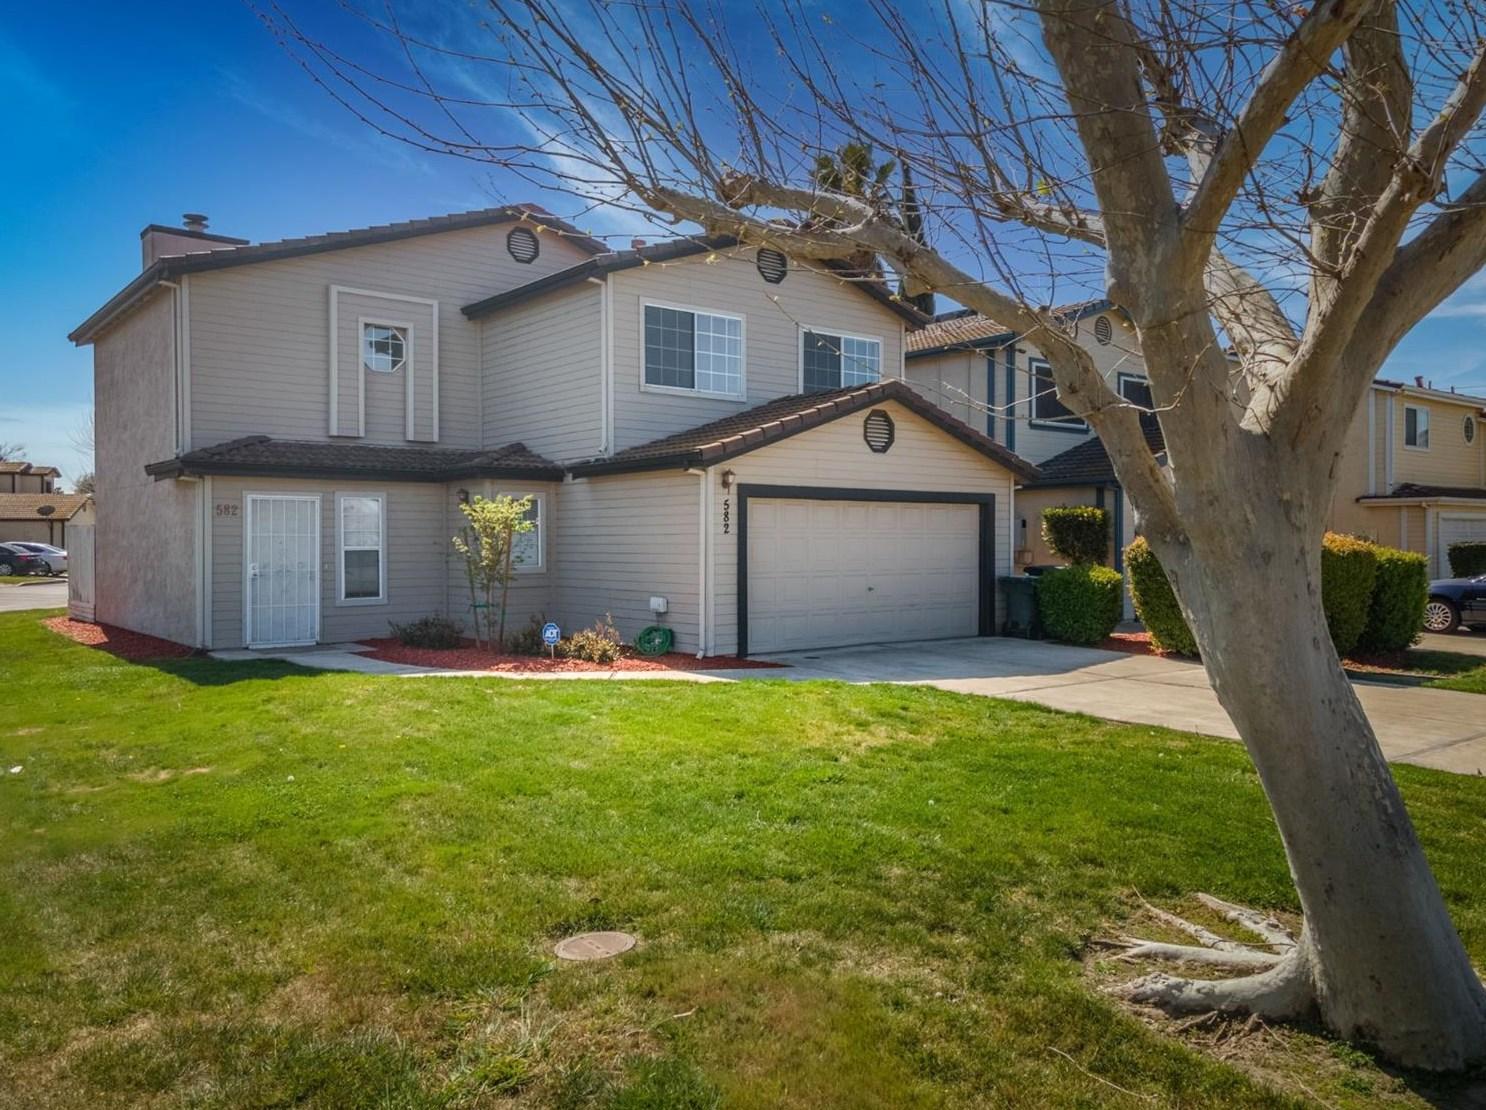 582 W 4th St, Tracy, CA 95376